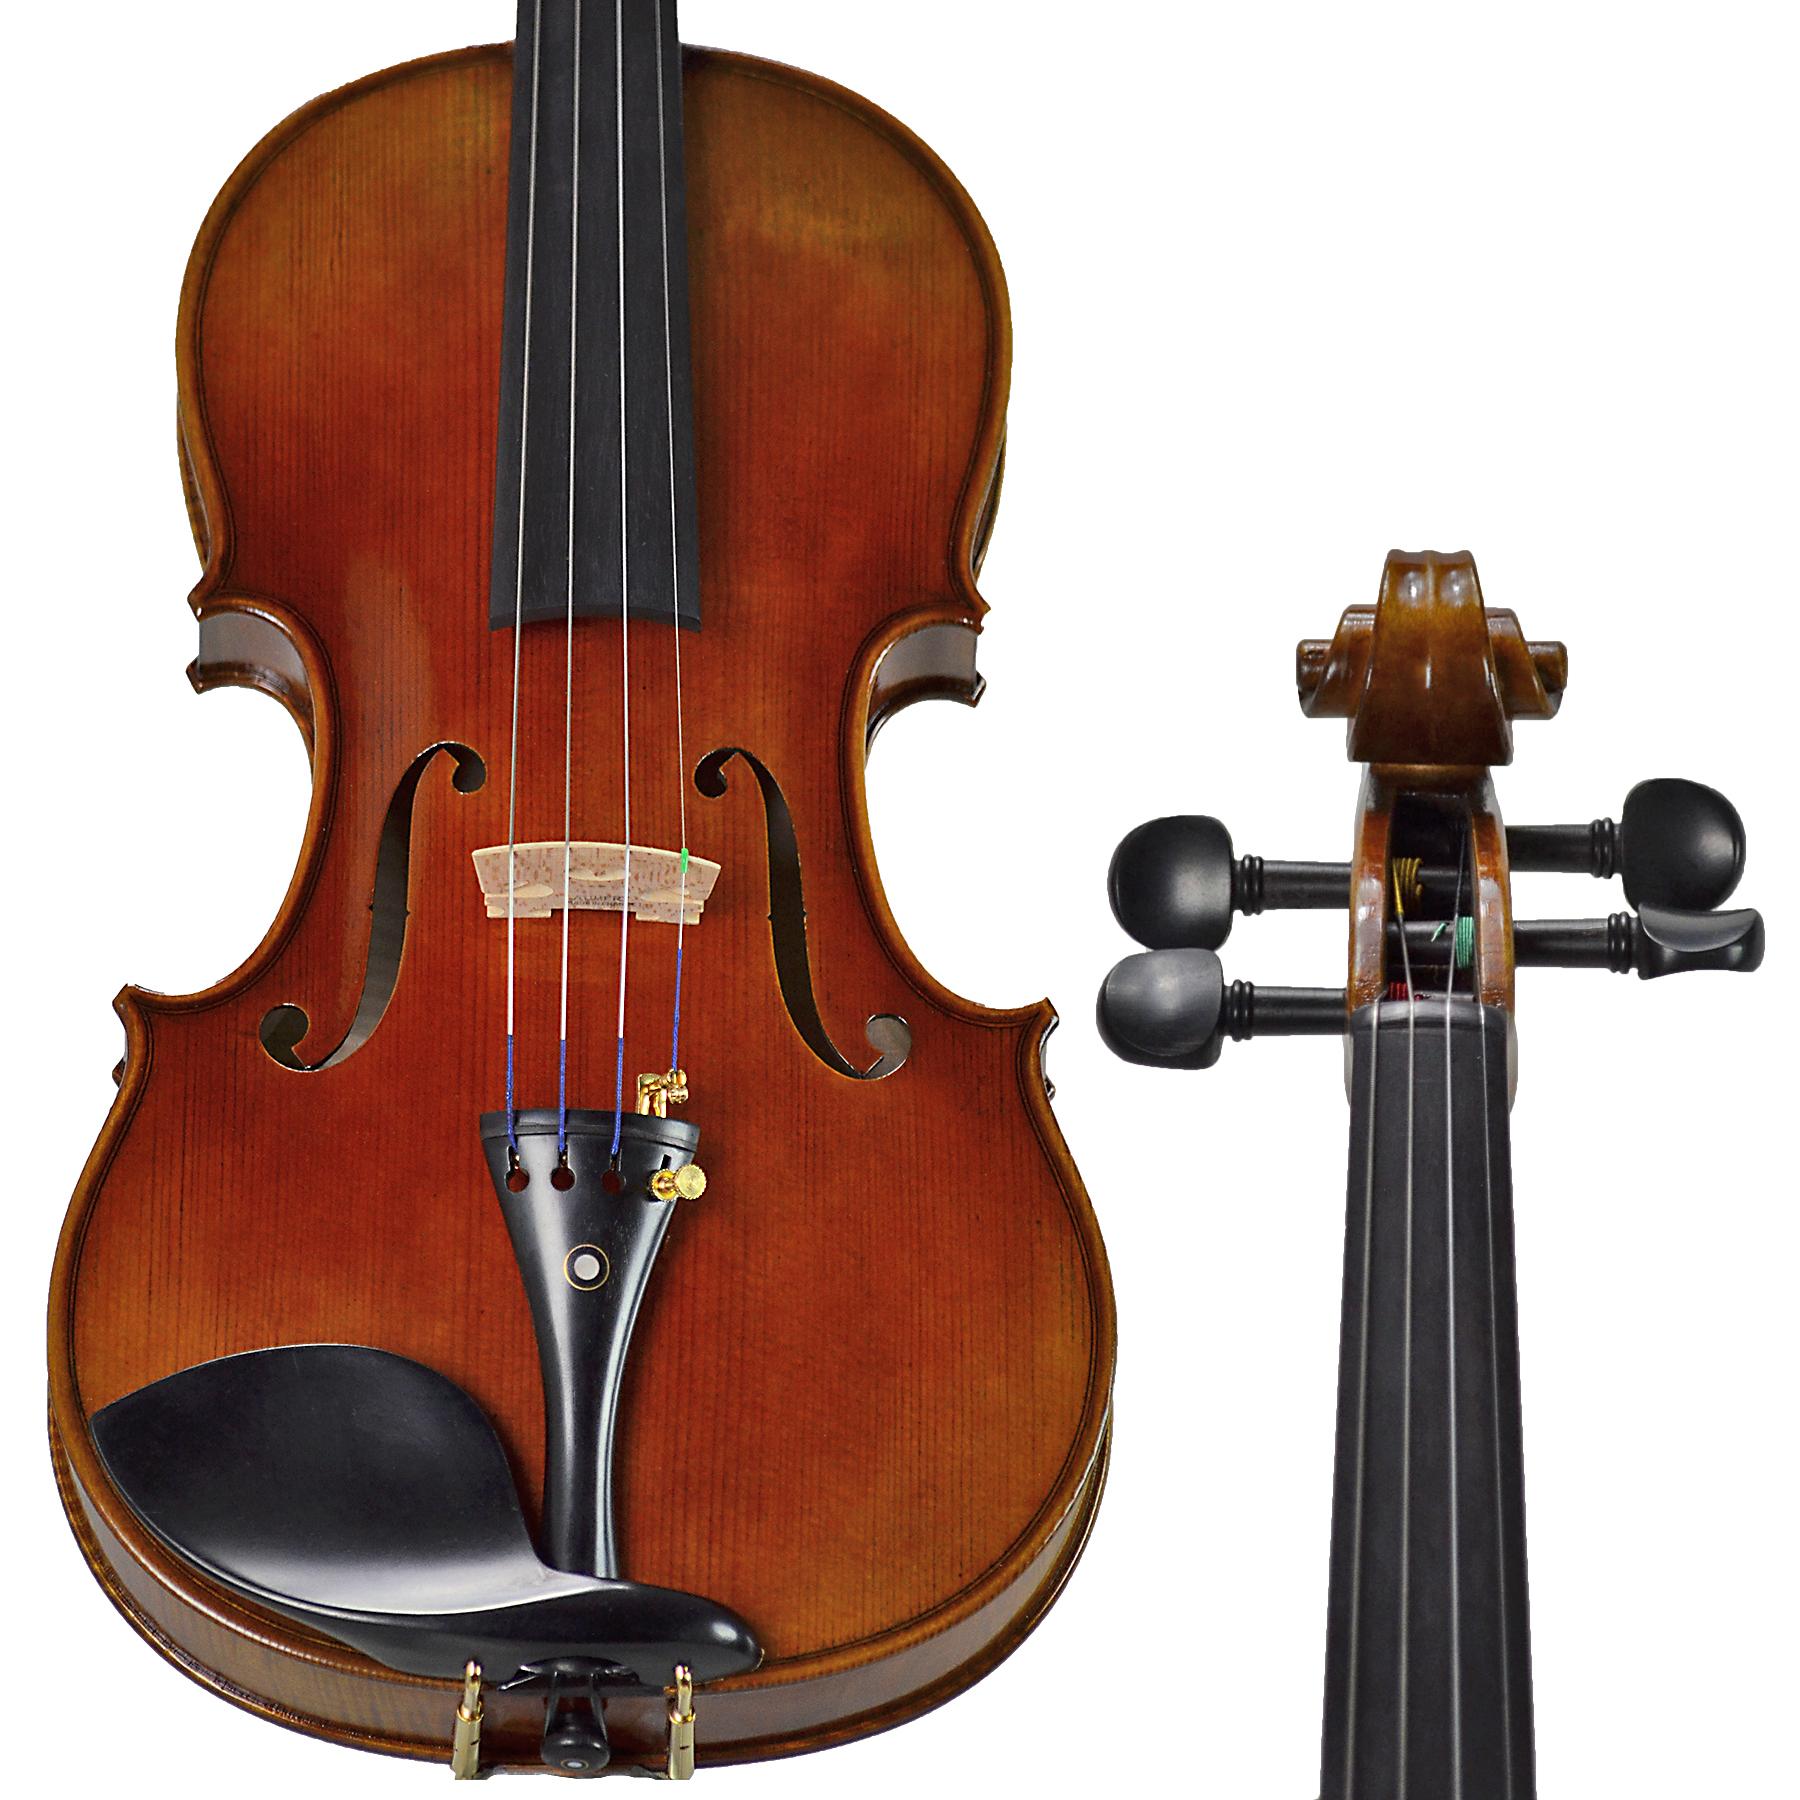 Nickola Zubak Violin Outfit in action